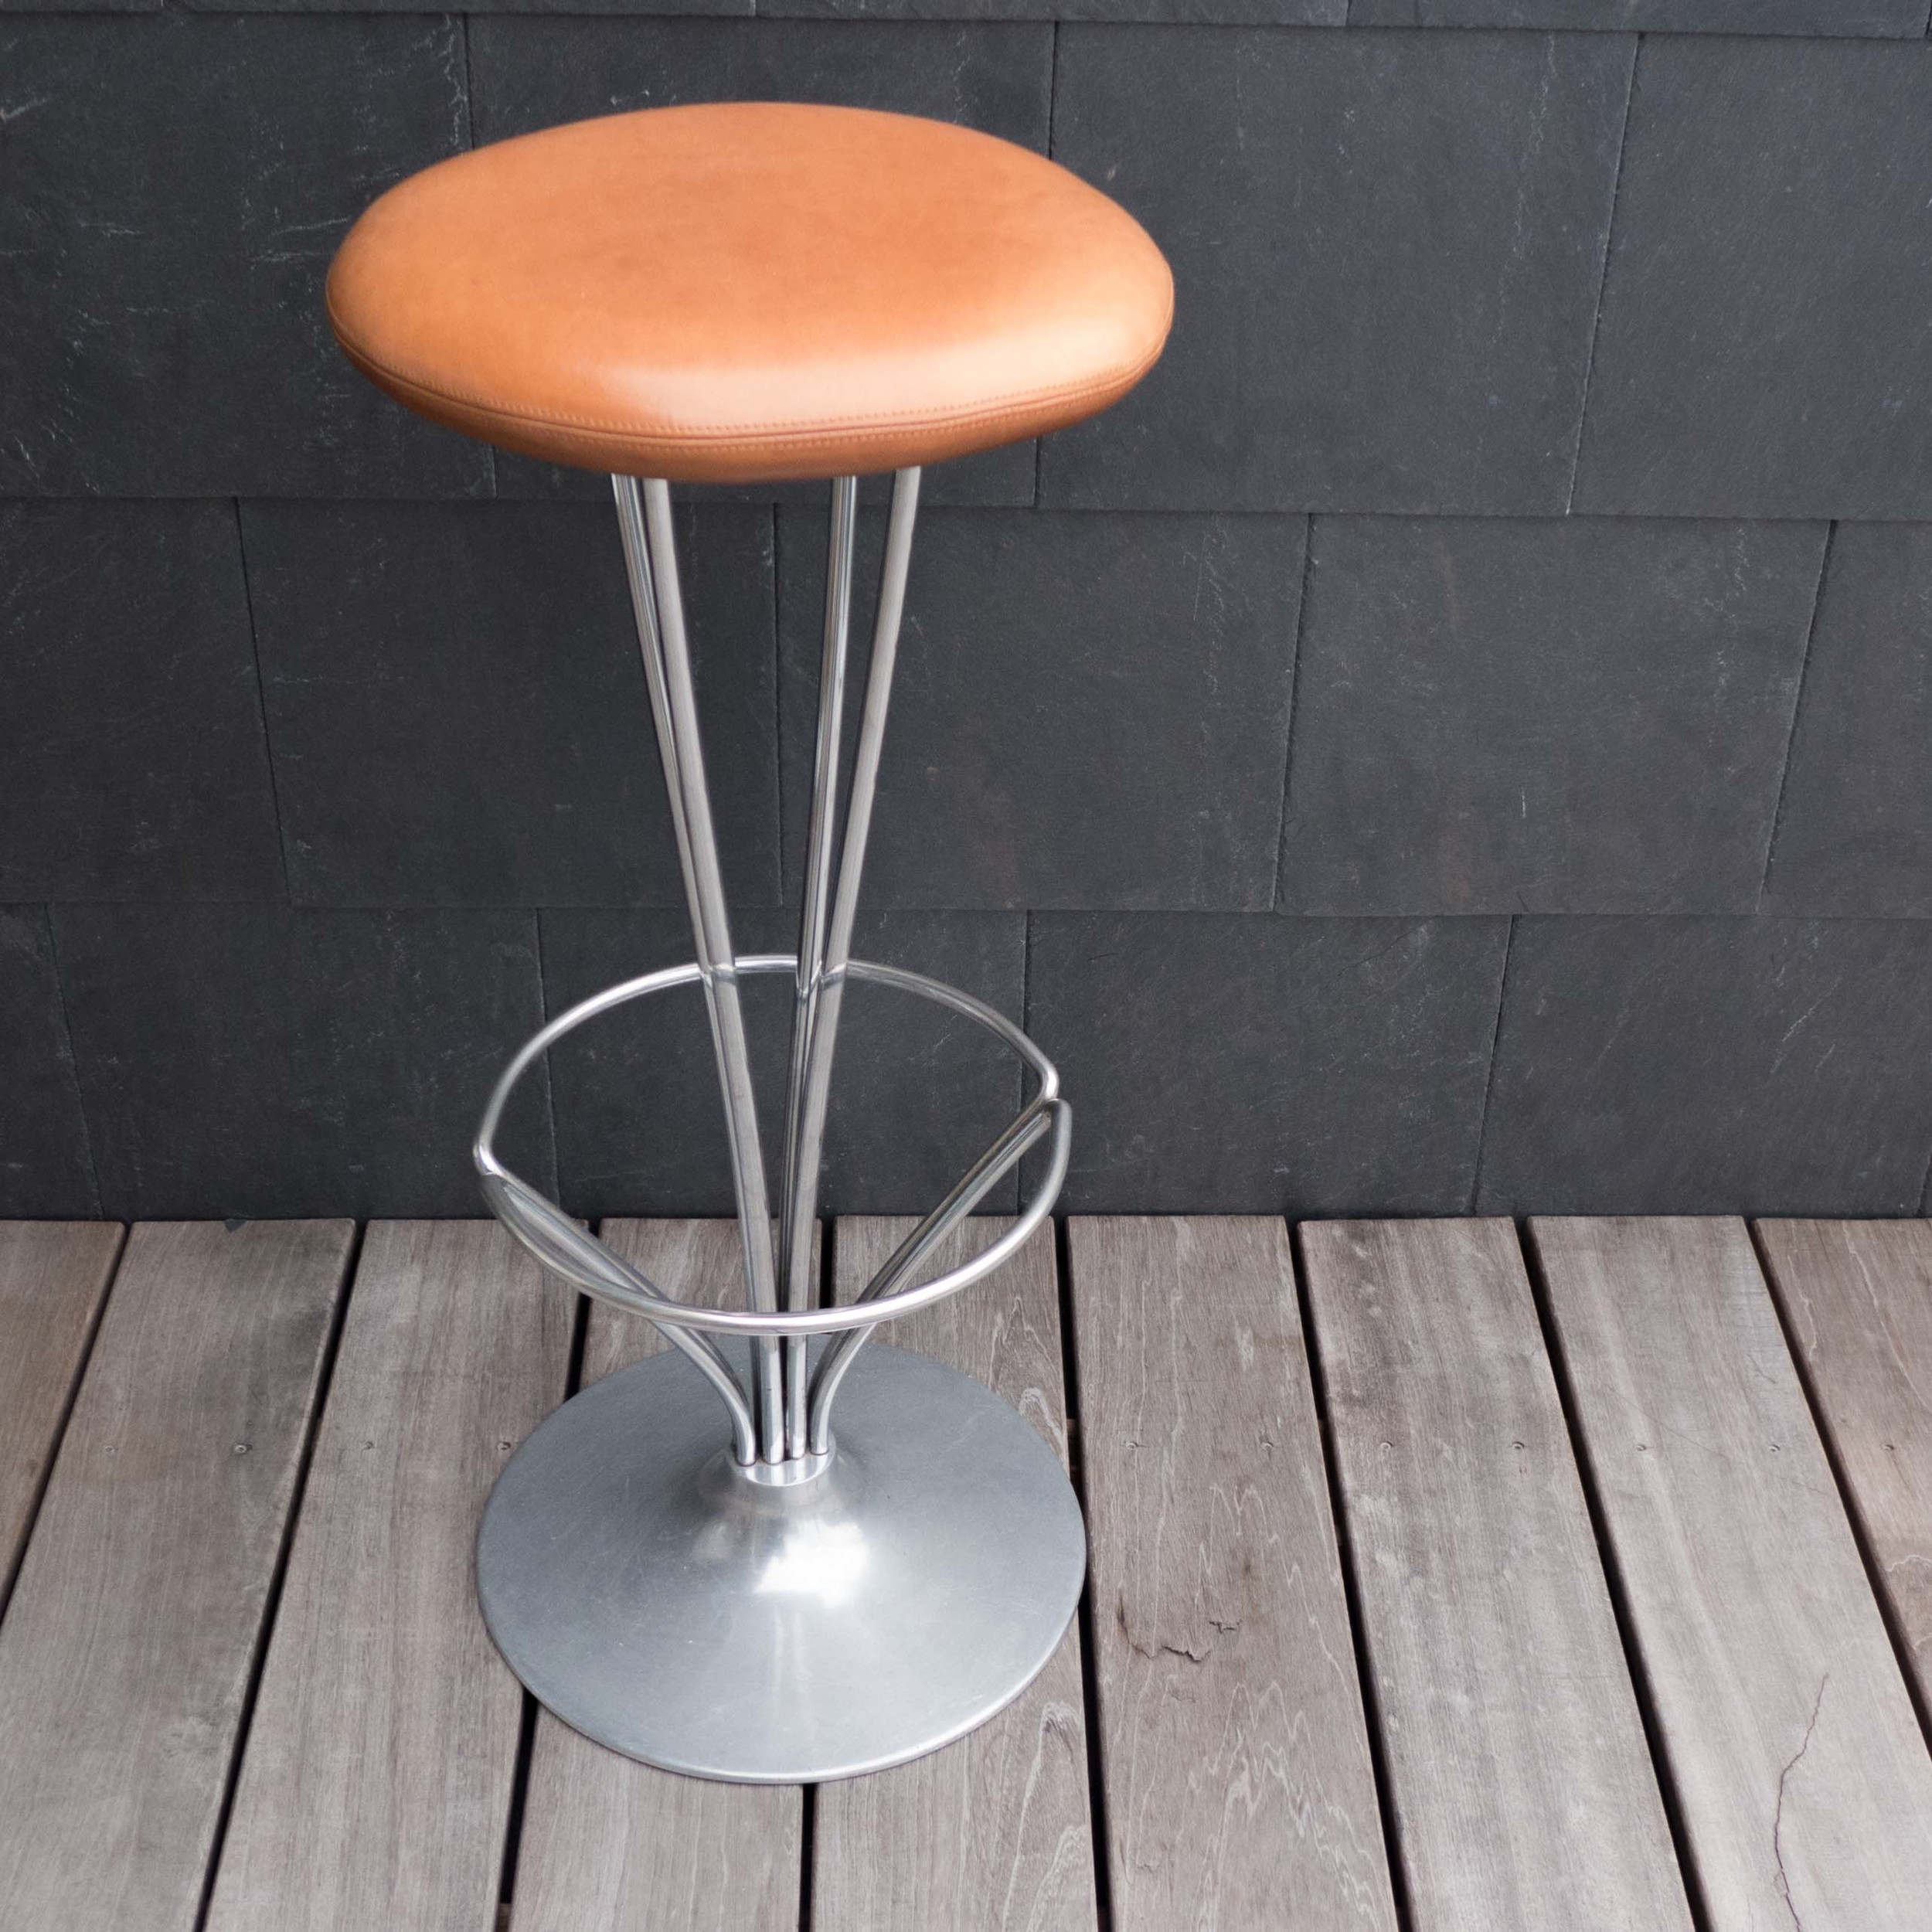 Hein stool.jpg